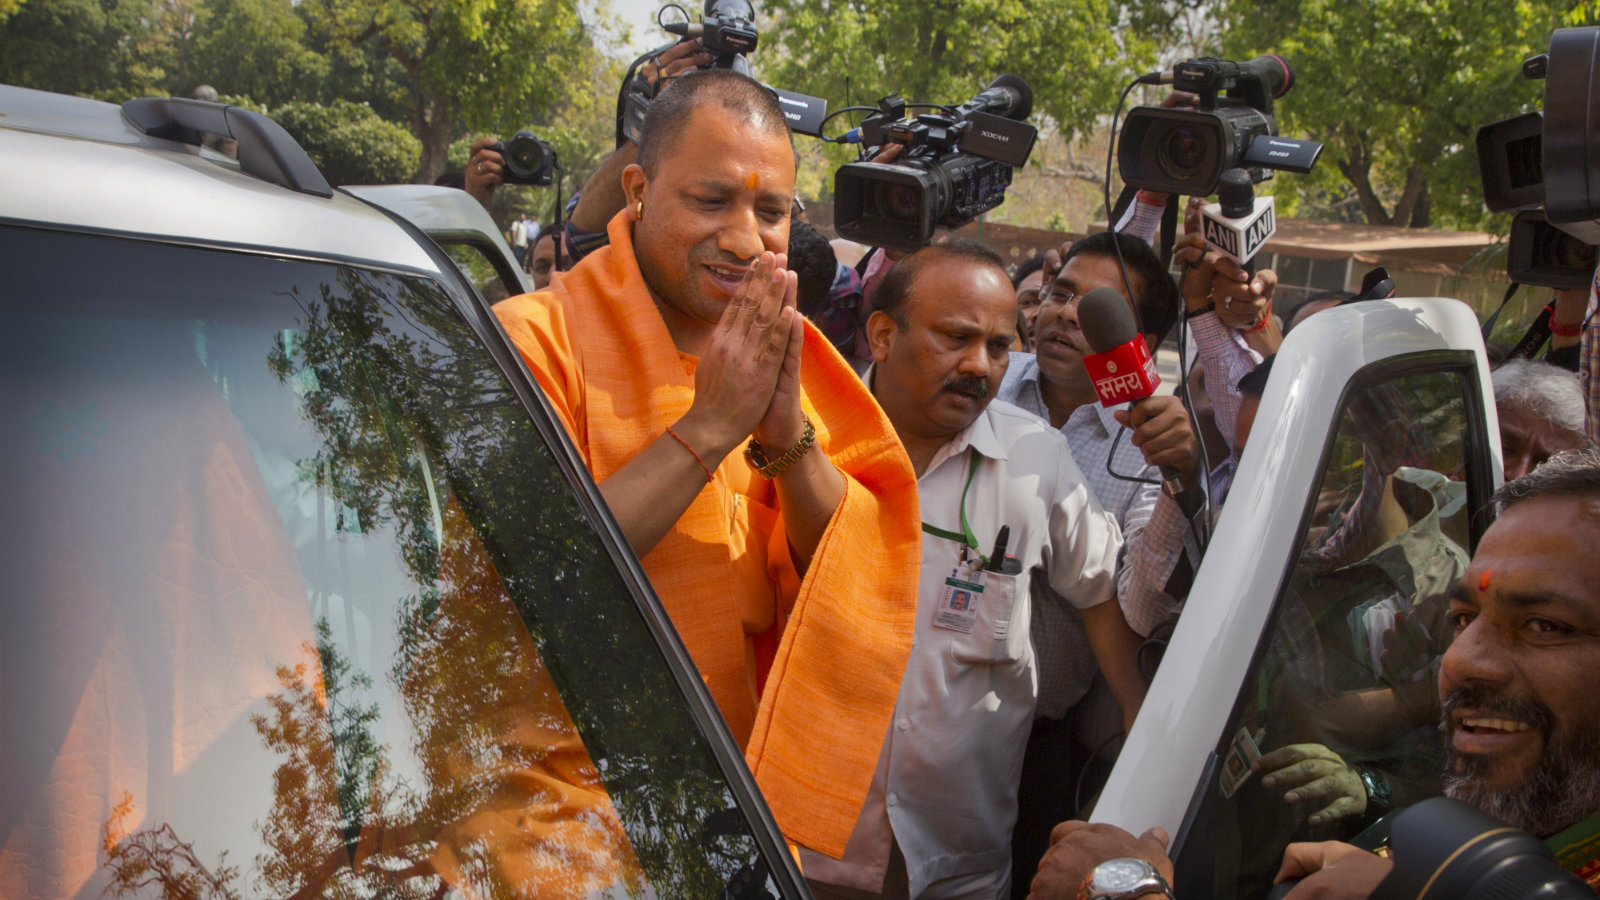 Uttar Pradesh chief minister Adityanath arrives at parliament in New Delhi on March 21, 2017. Adityanath was sworn in as chief minister on Sunday, March 19.